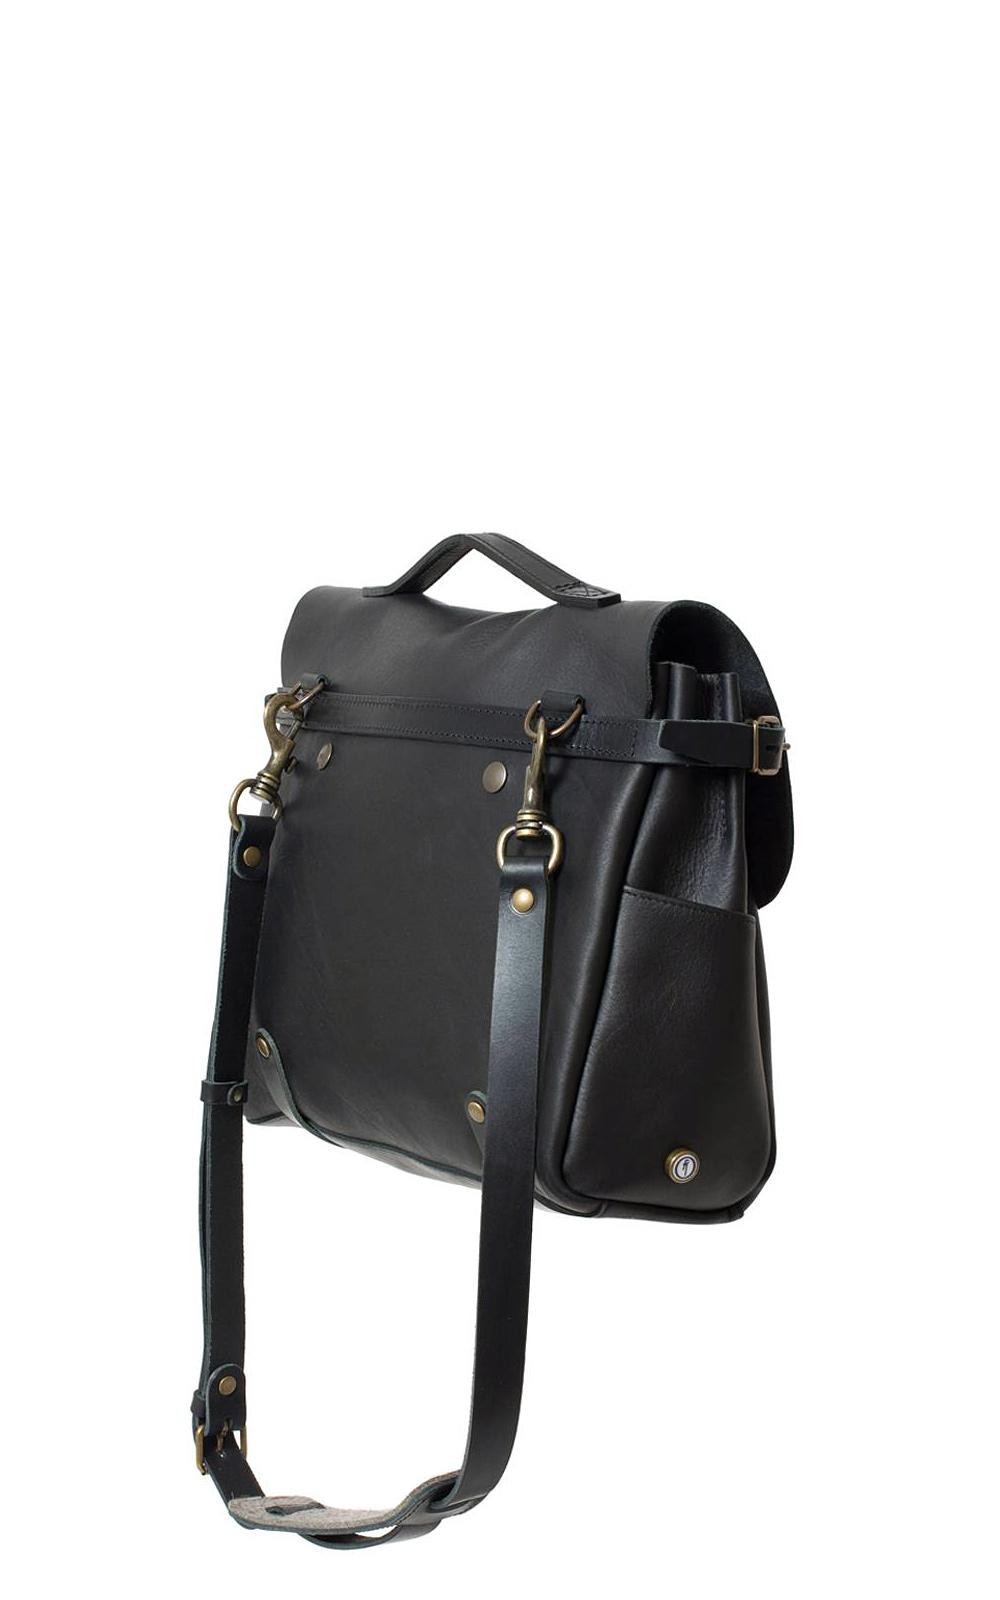 Lyst - Bleu De Chauffe Postman Bag Eclair M Noir in Black for Men 09153c6bd5962